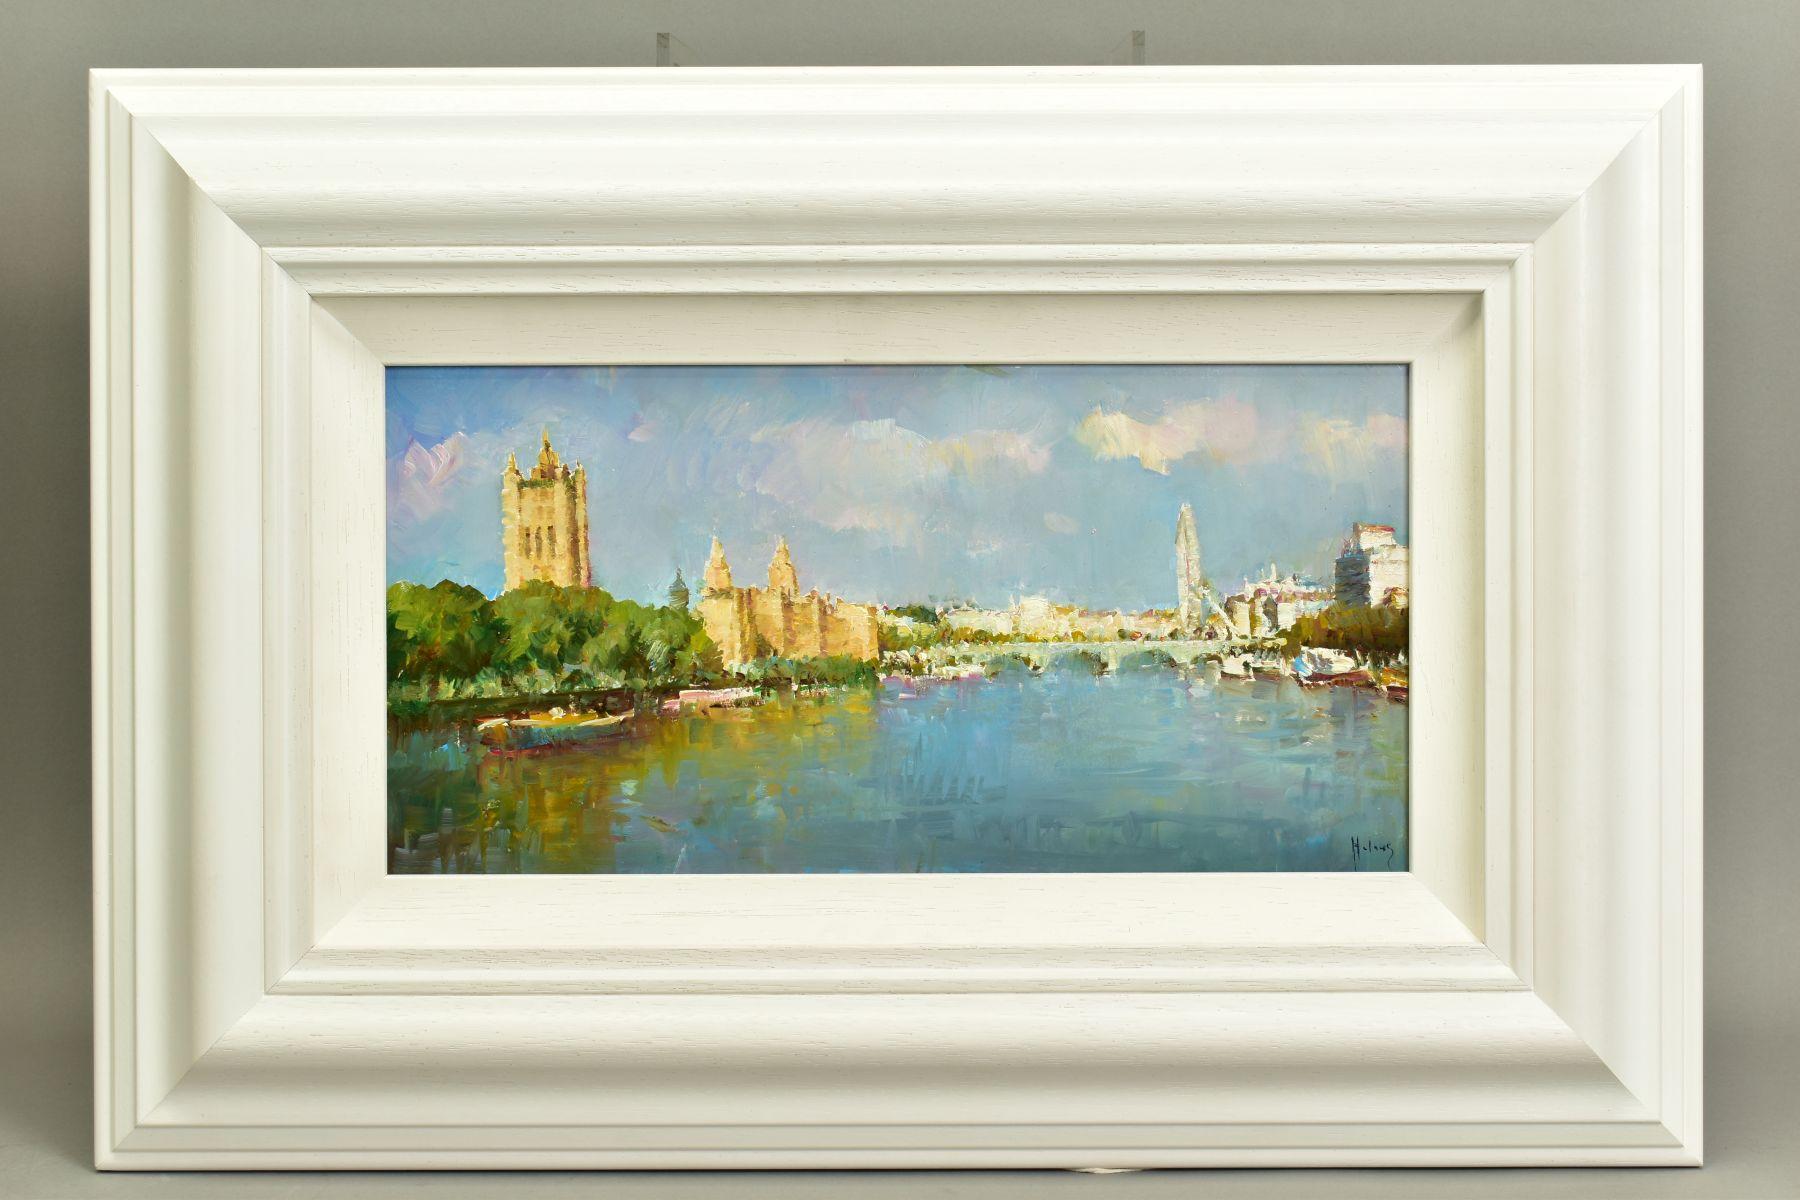 HELIOS GISBERT (SPANISH 1958), 'The Thames, London II', an impressionist view of a London skyline,